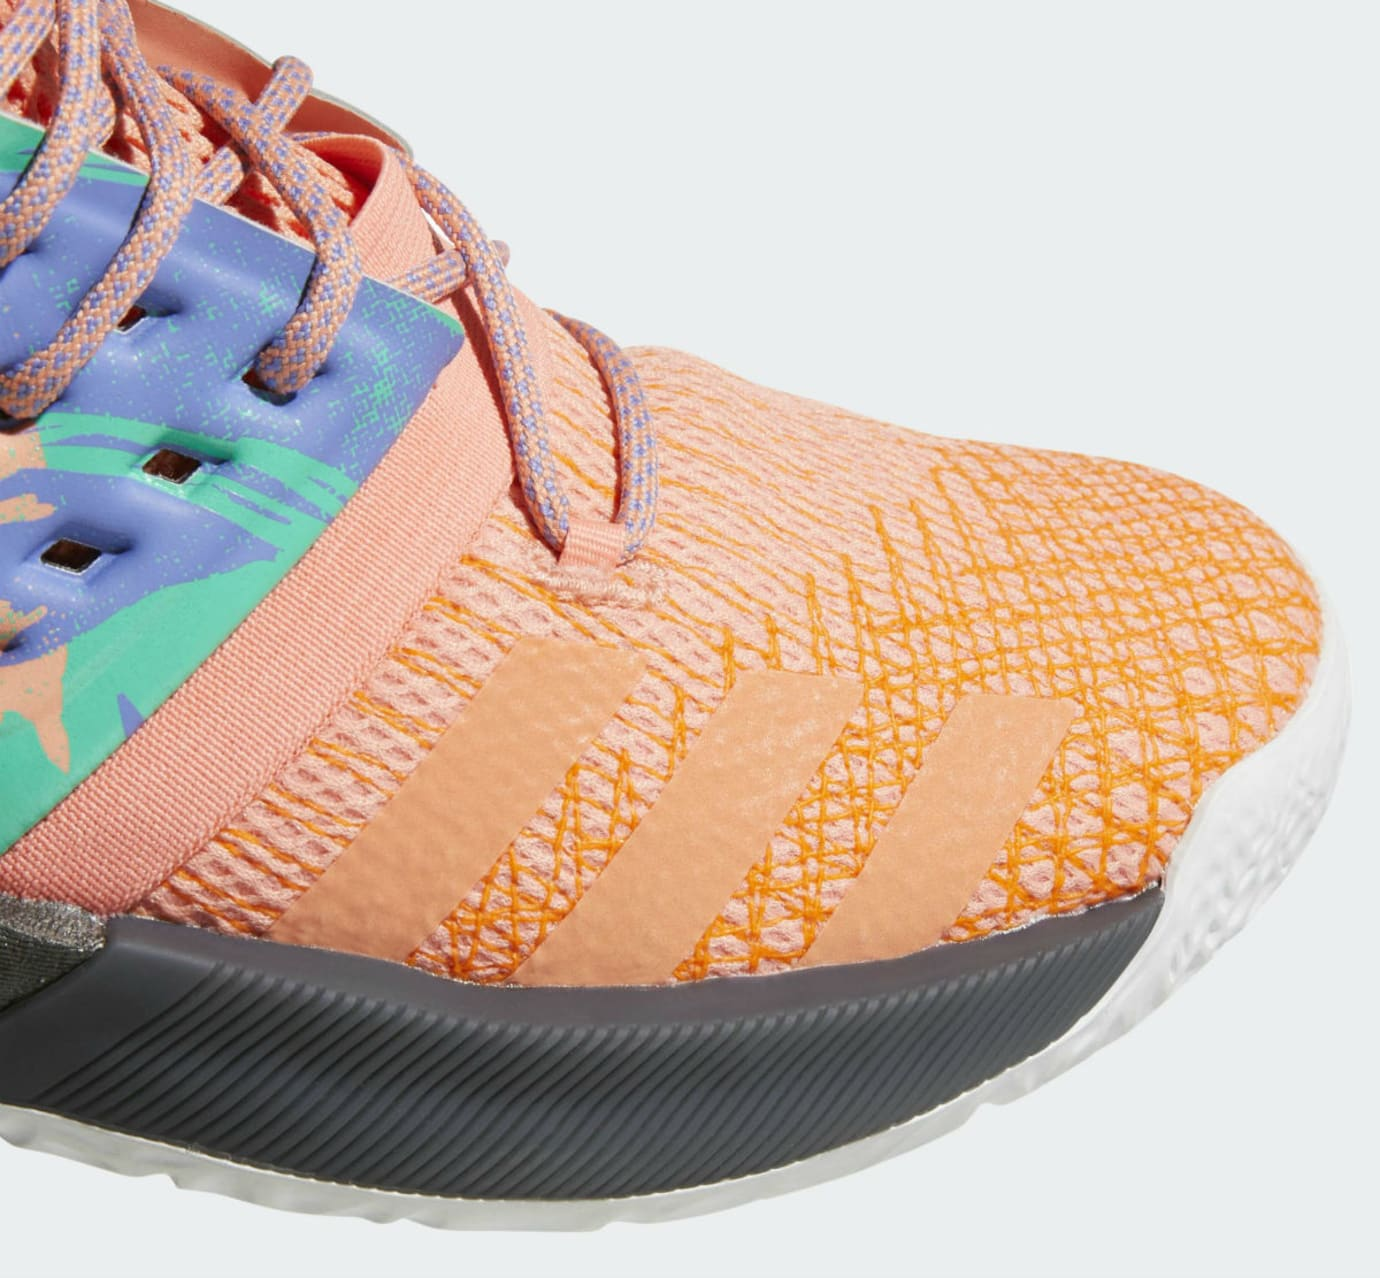 40ec4a529ab Adidas Harden Vol. 2 Orange Release Date AH2219 Toe